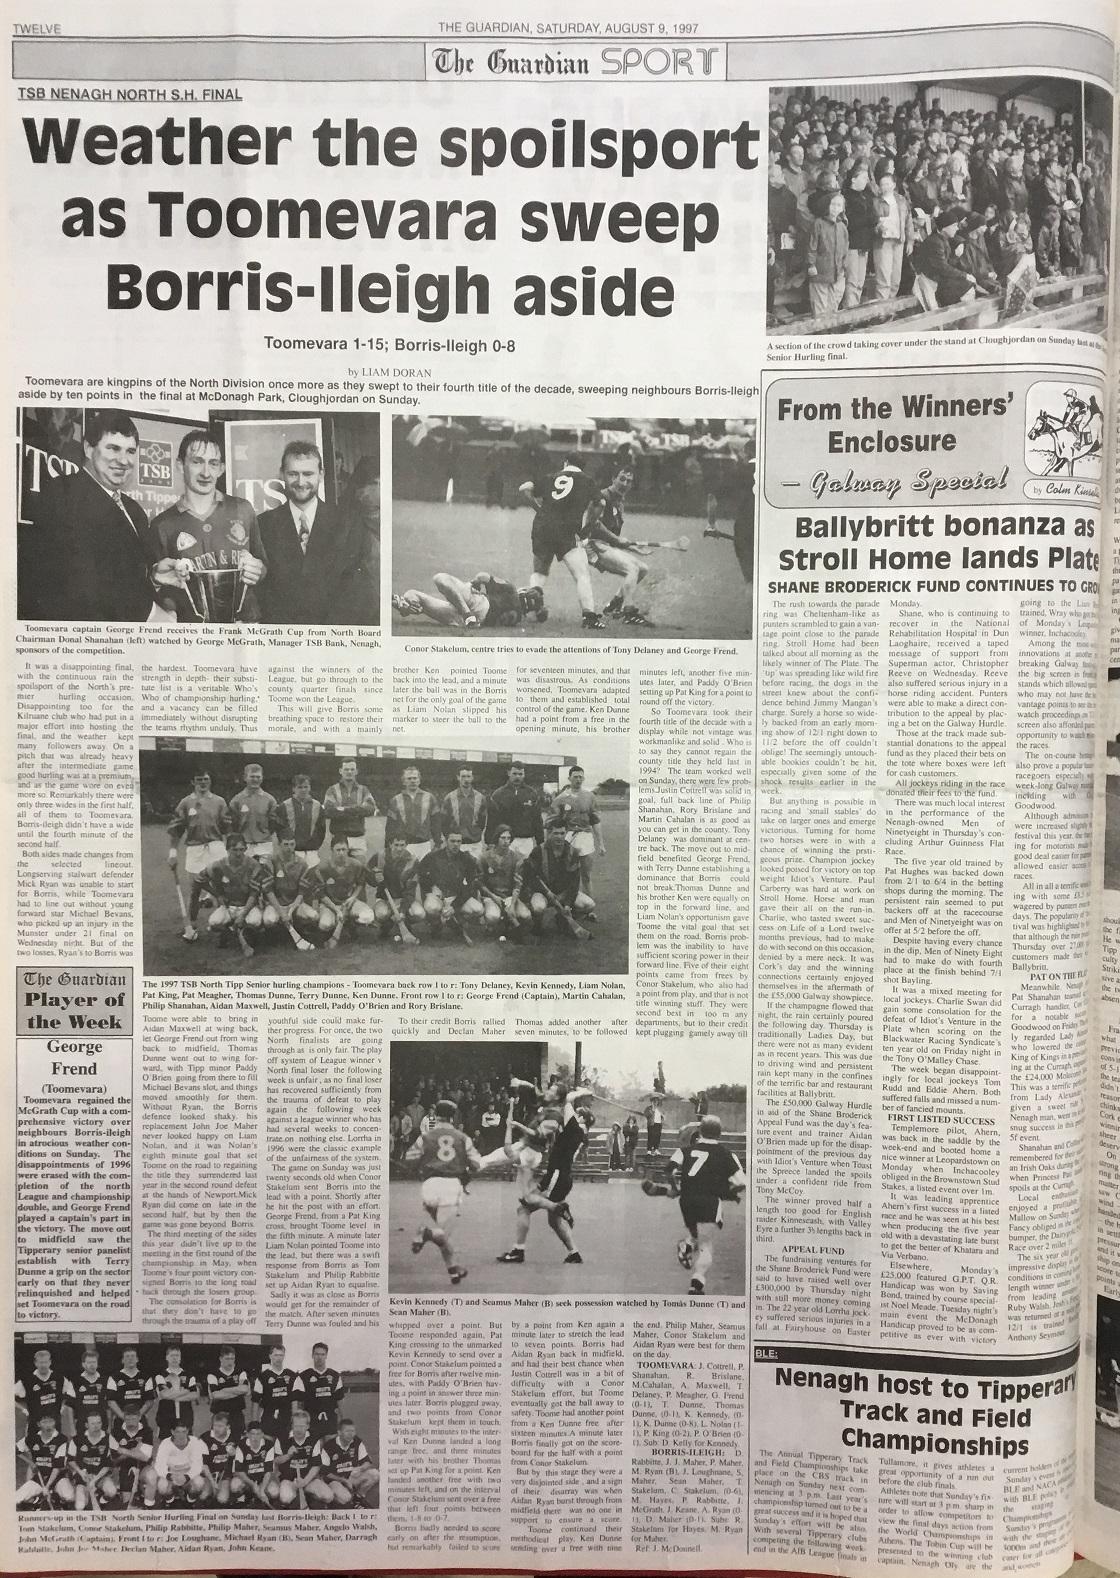 1997 North hurling final